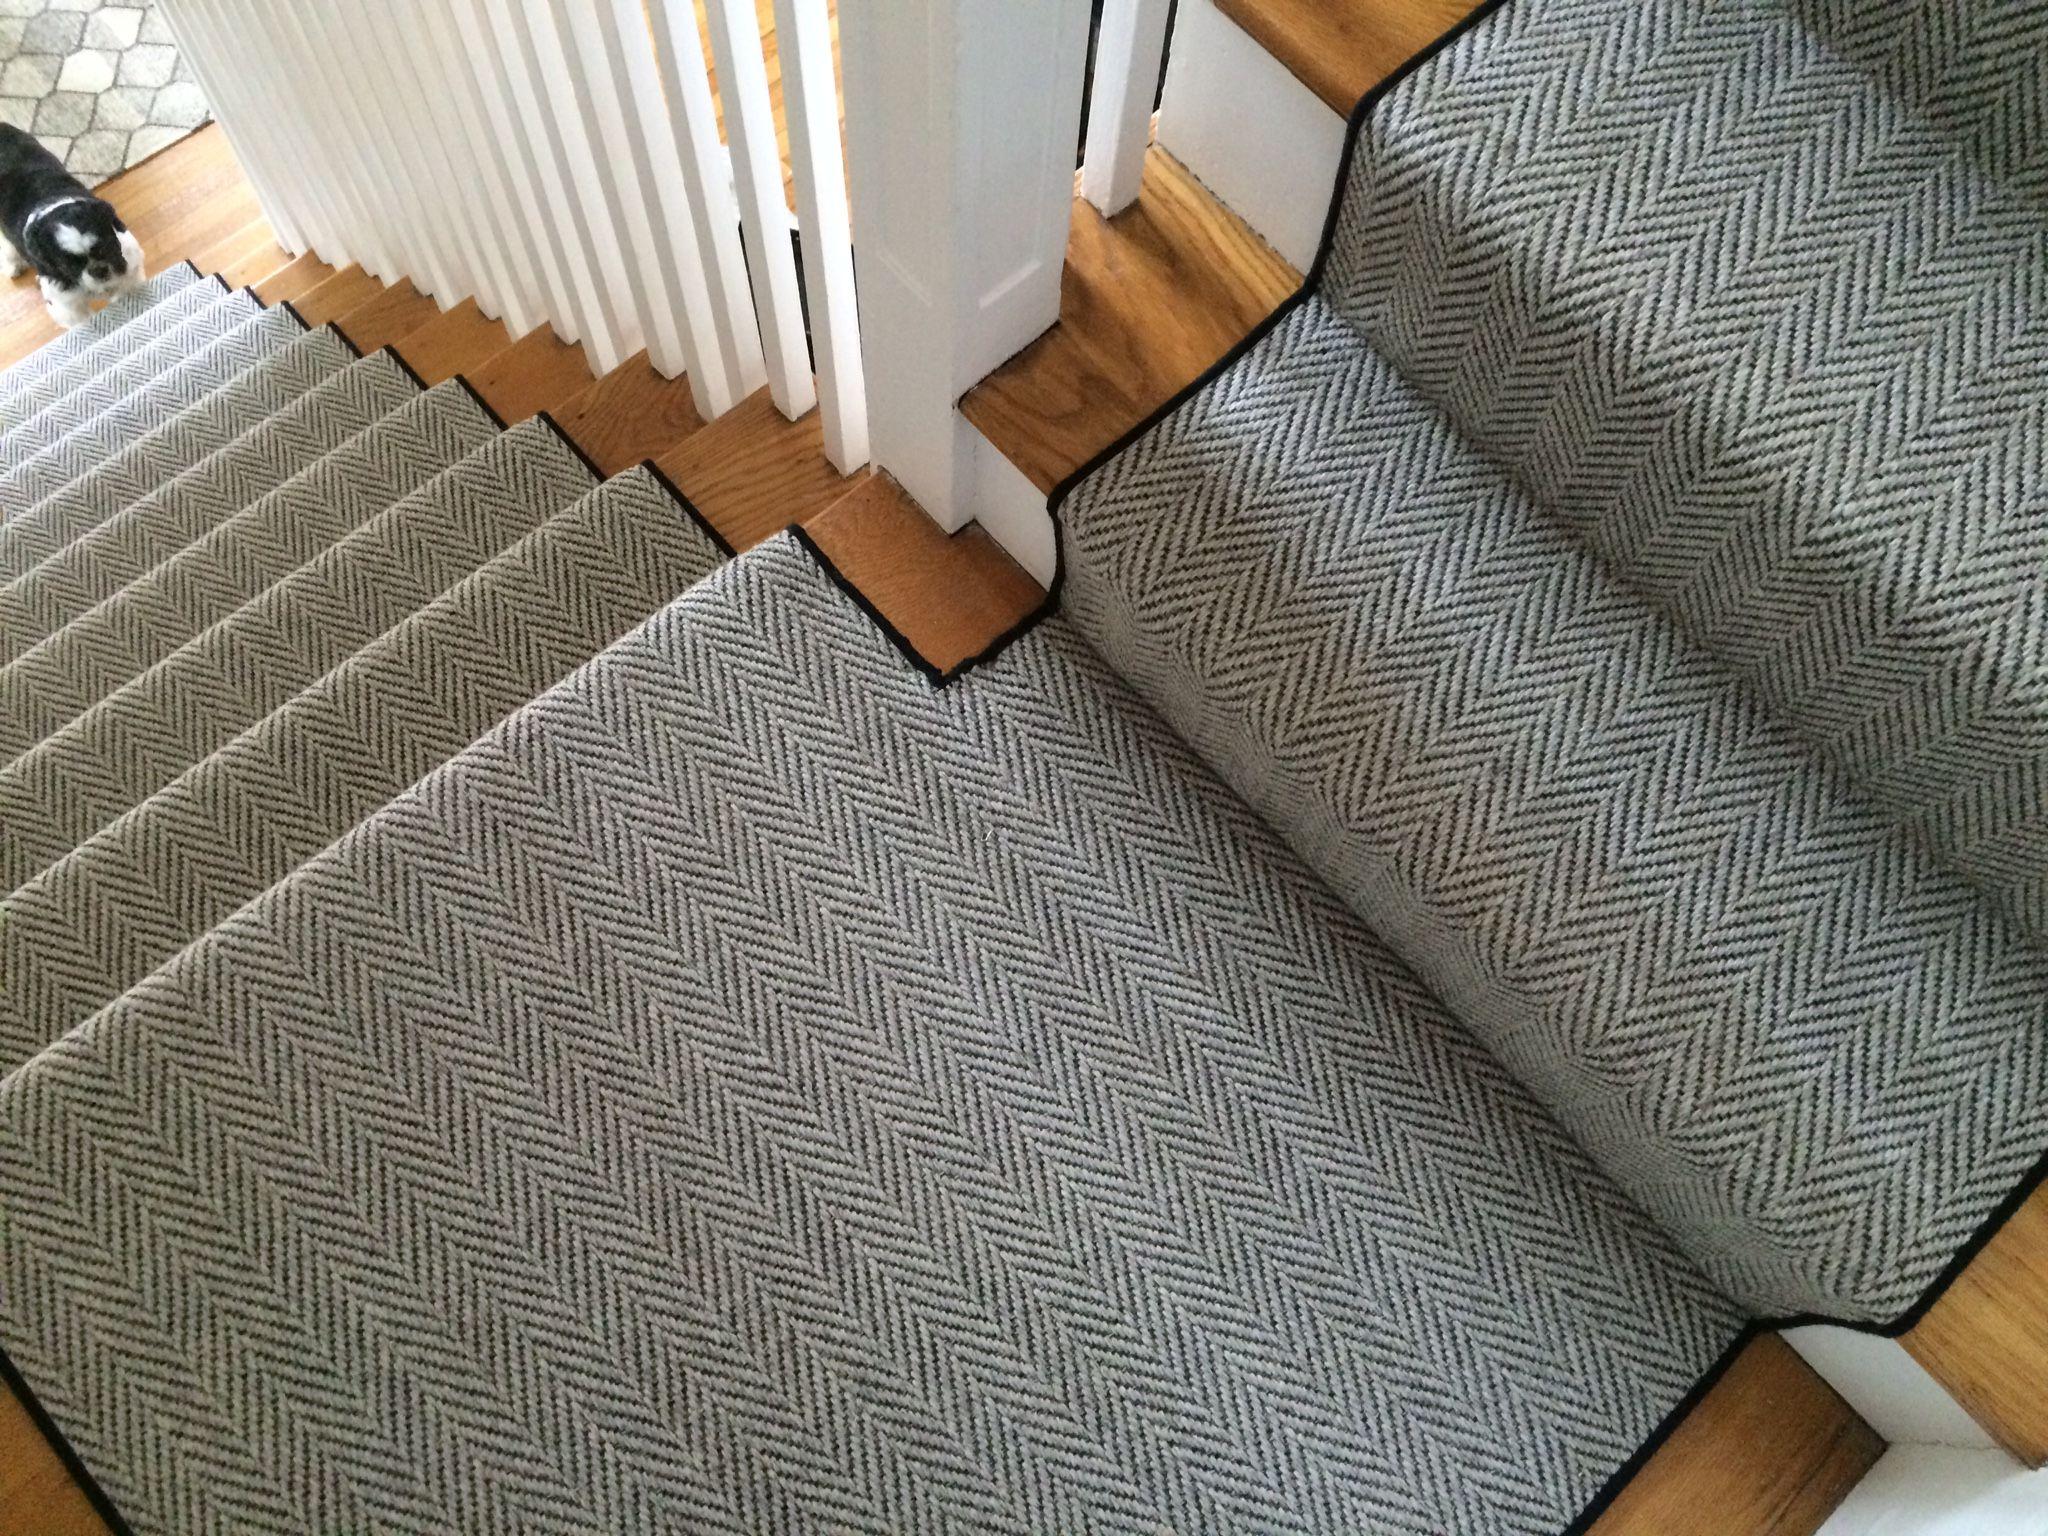 Herringbone Carpet Is One Of My Favorite Looks Because I Love The | Best Carpet For Basement Stairs | Patterned Carpet | Bob Vila | Carpet Runners | Staircase Runner | Hallway